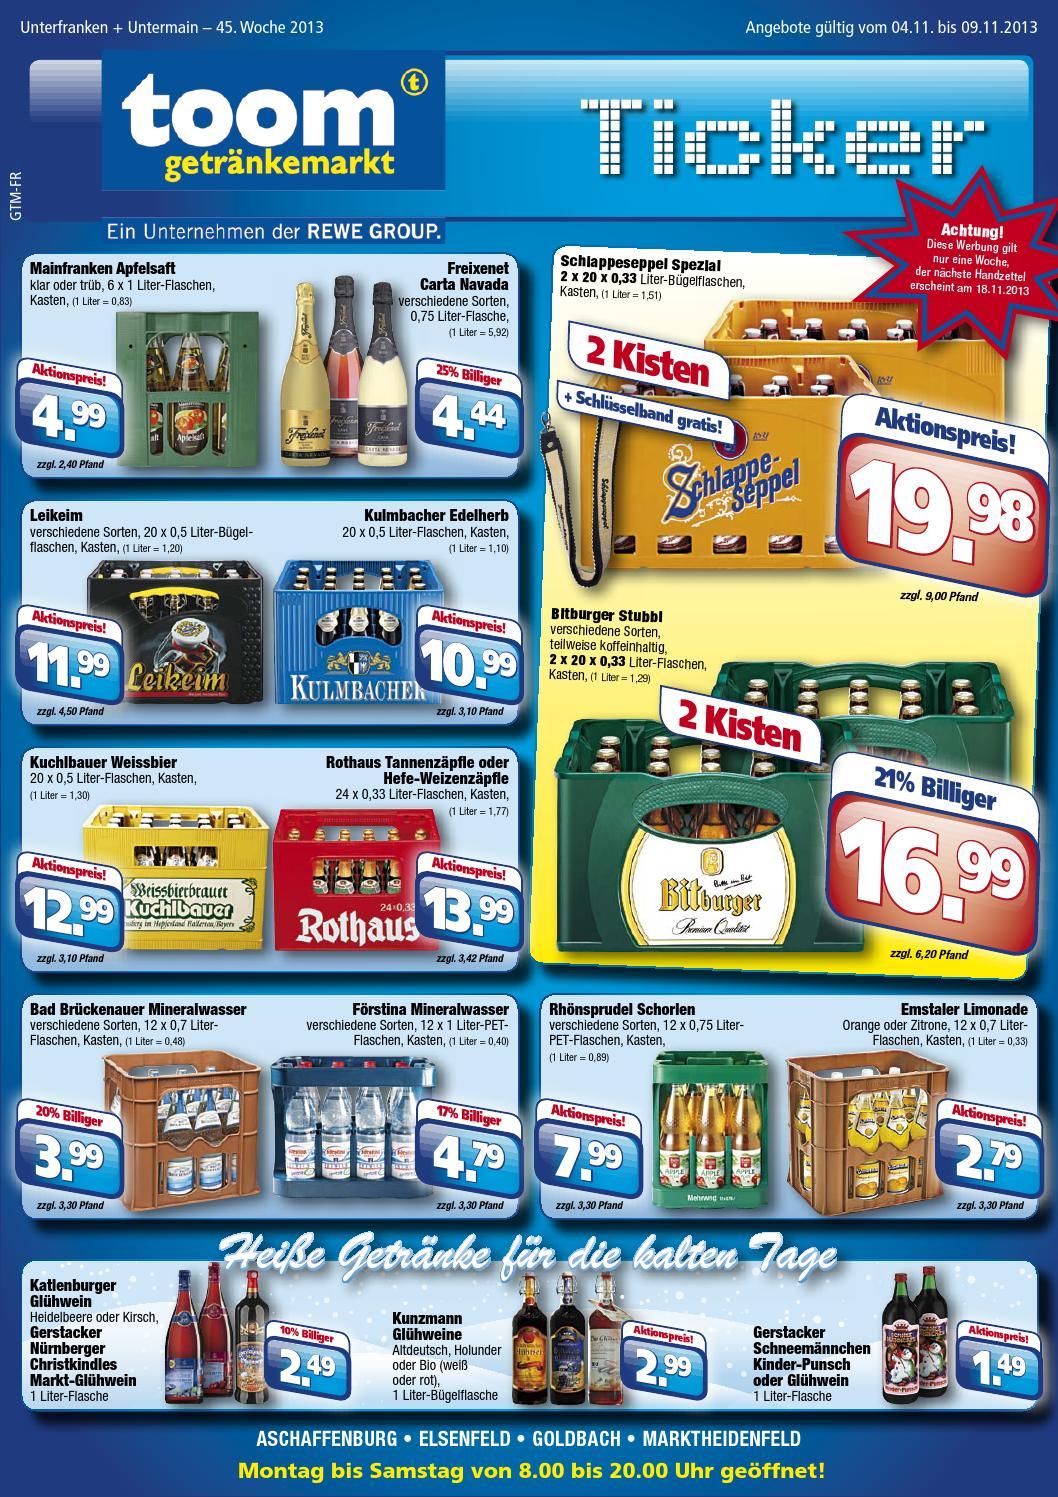 Toom Getränkemarkt Katalog gültig bis 09/11 by broshuri - issuu